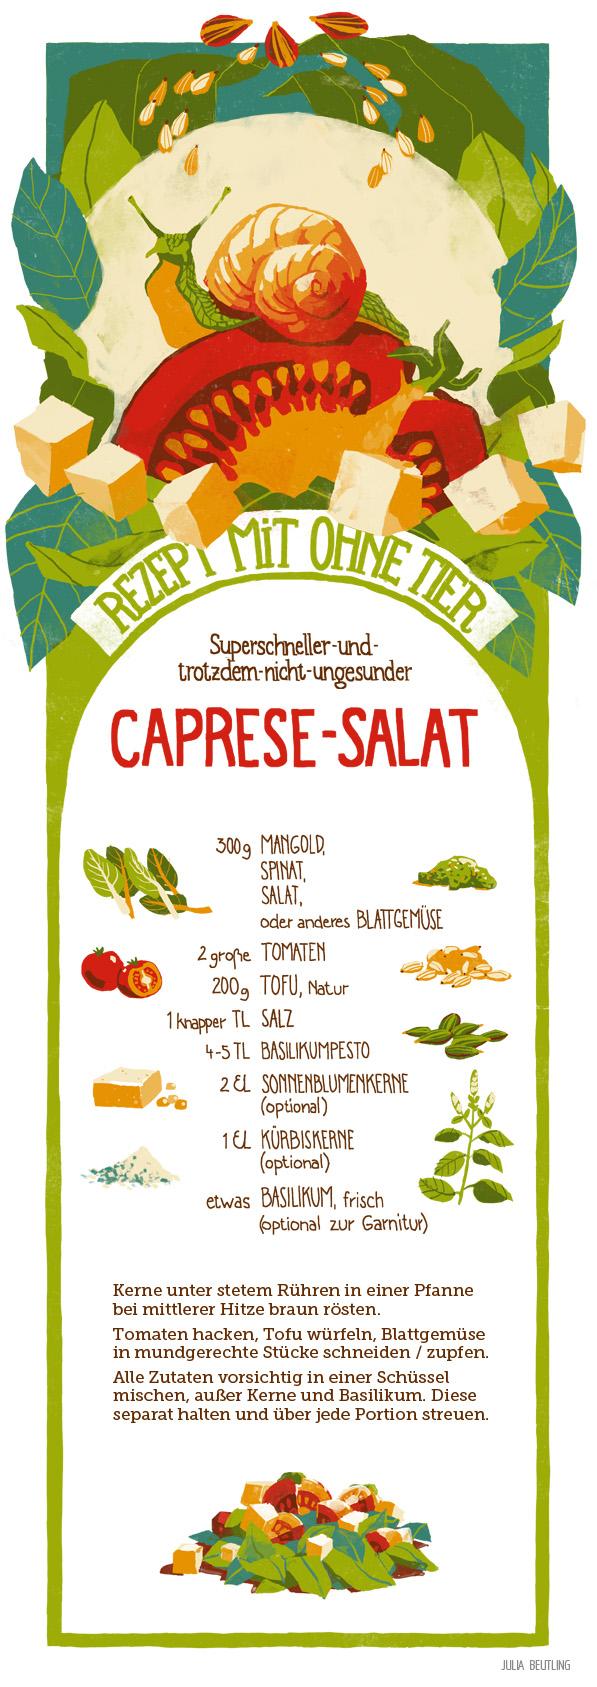 WEB rezept 6 DE caprese-salat julia beutling